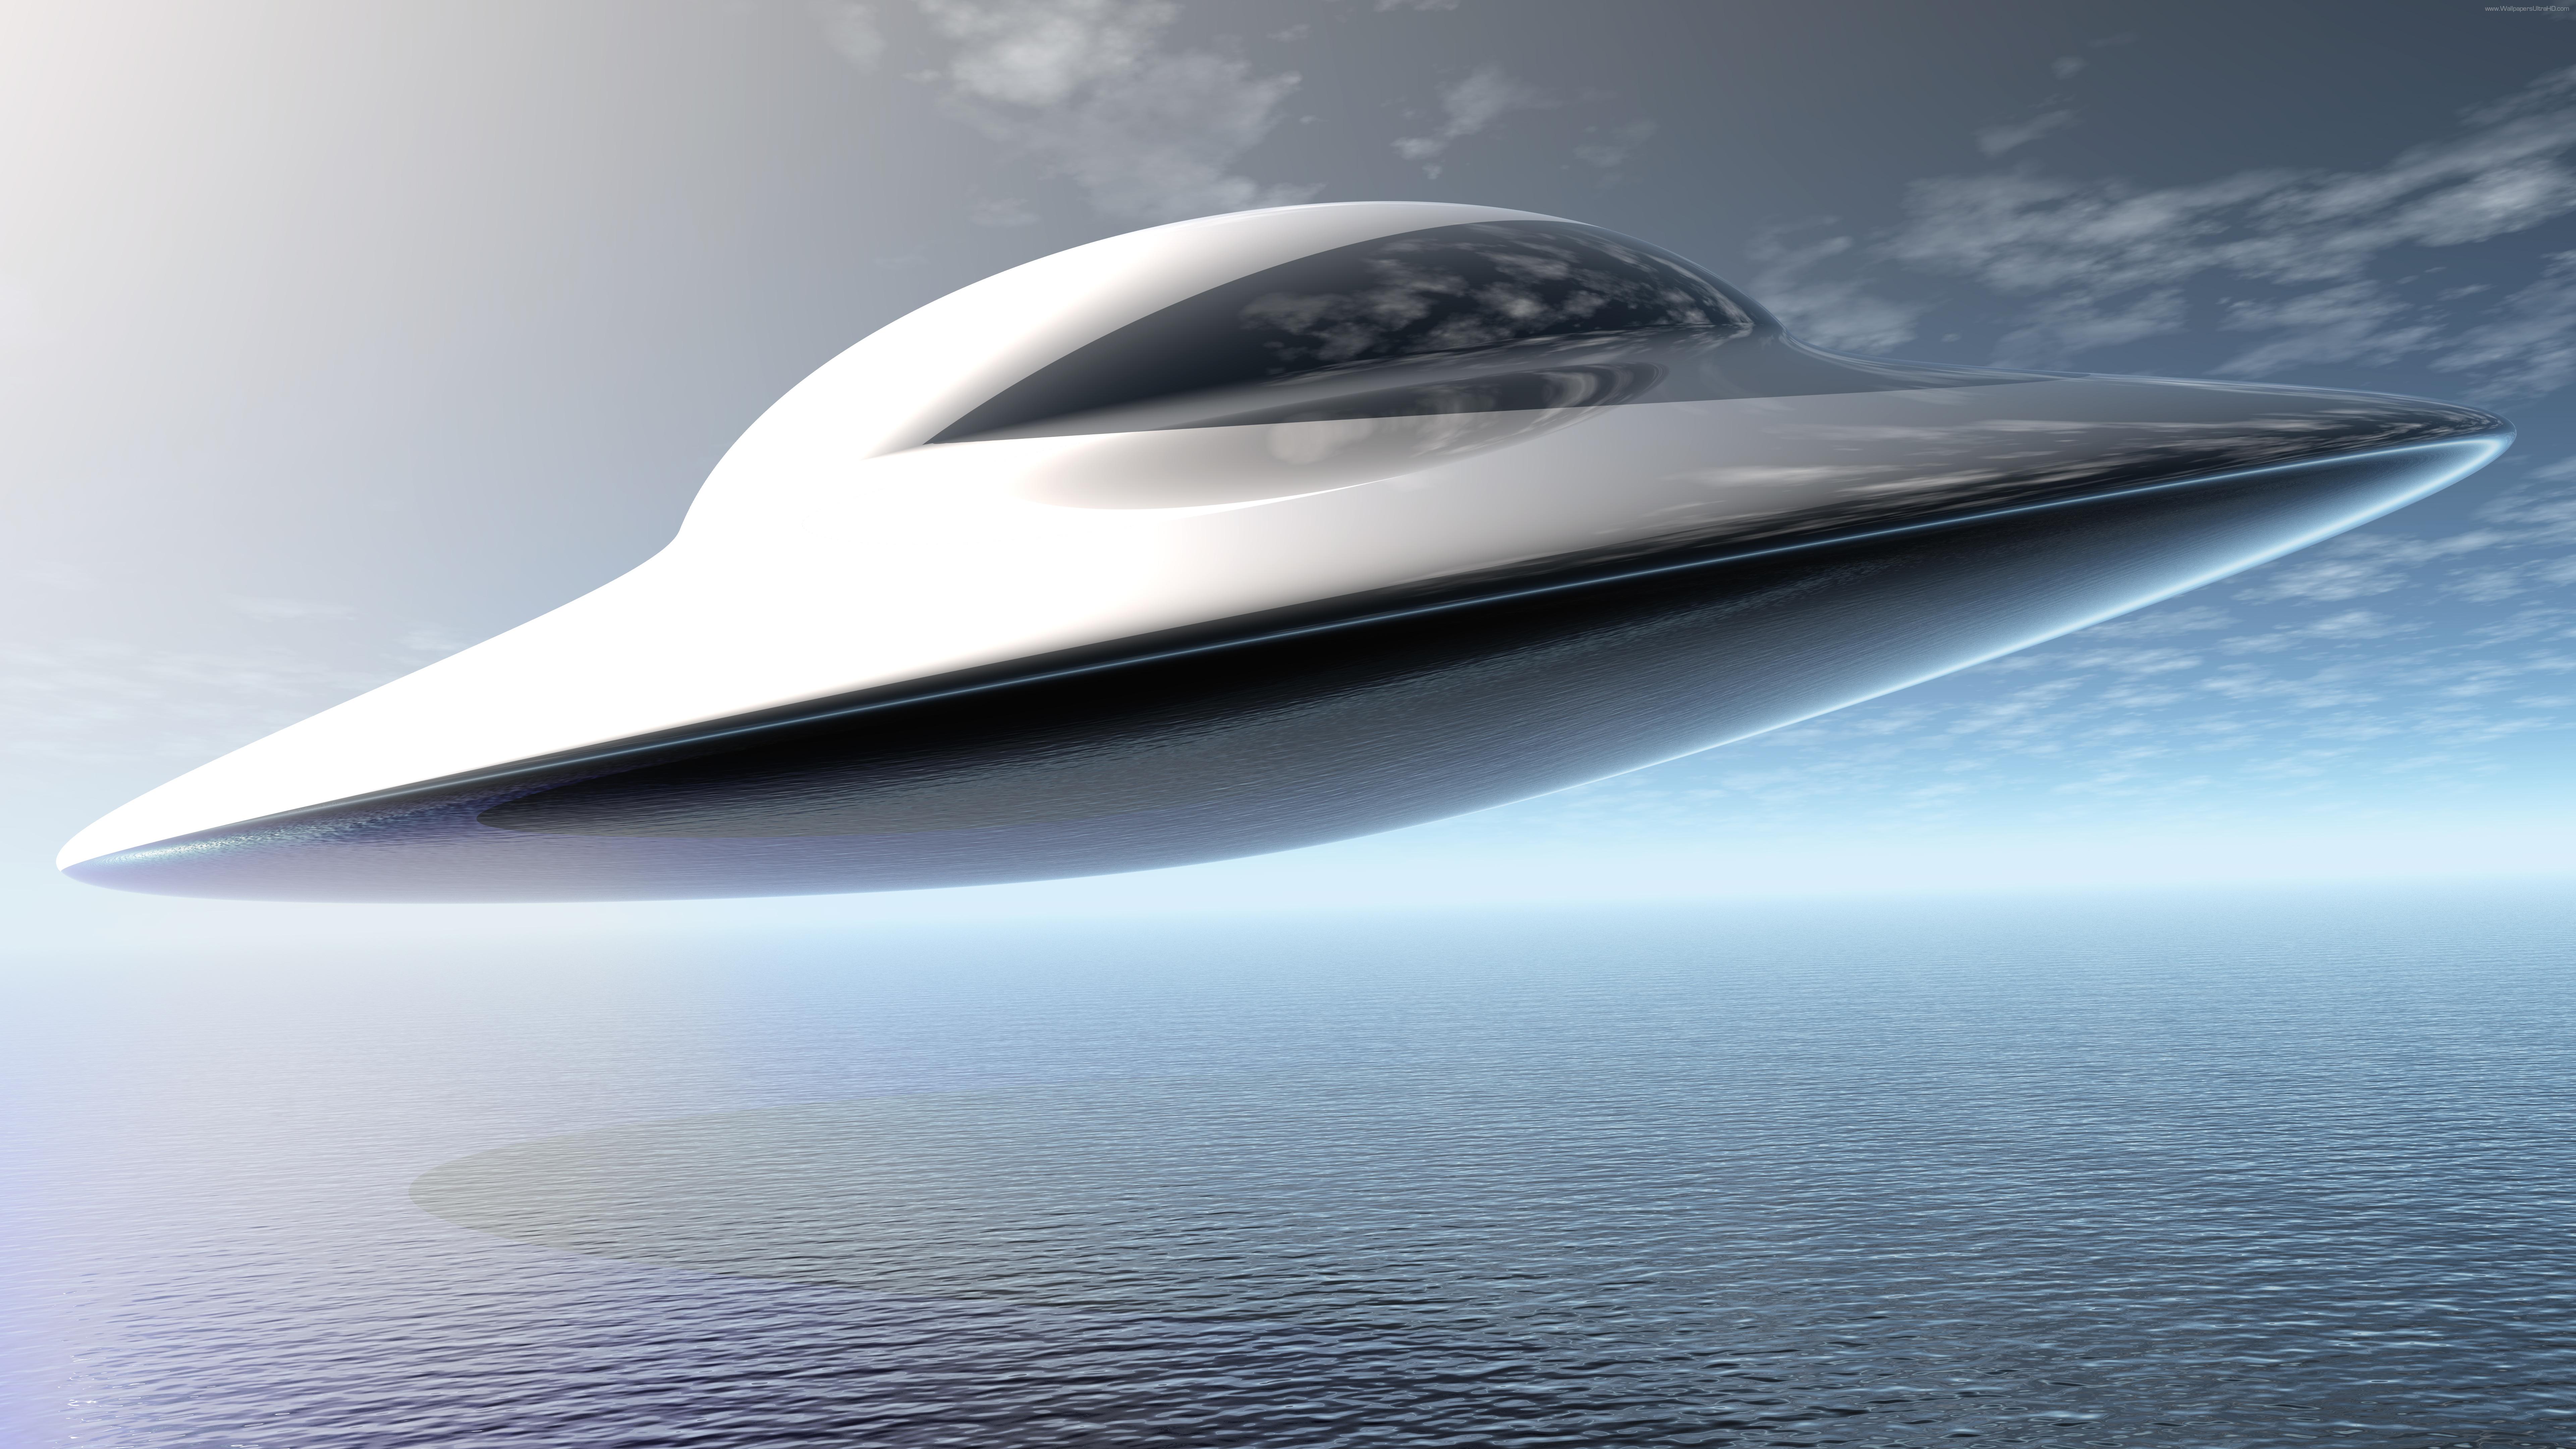 Best 51 UFO Files Wallpaper on HipWallpaper Moving UFO 7680x4320